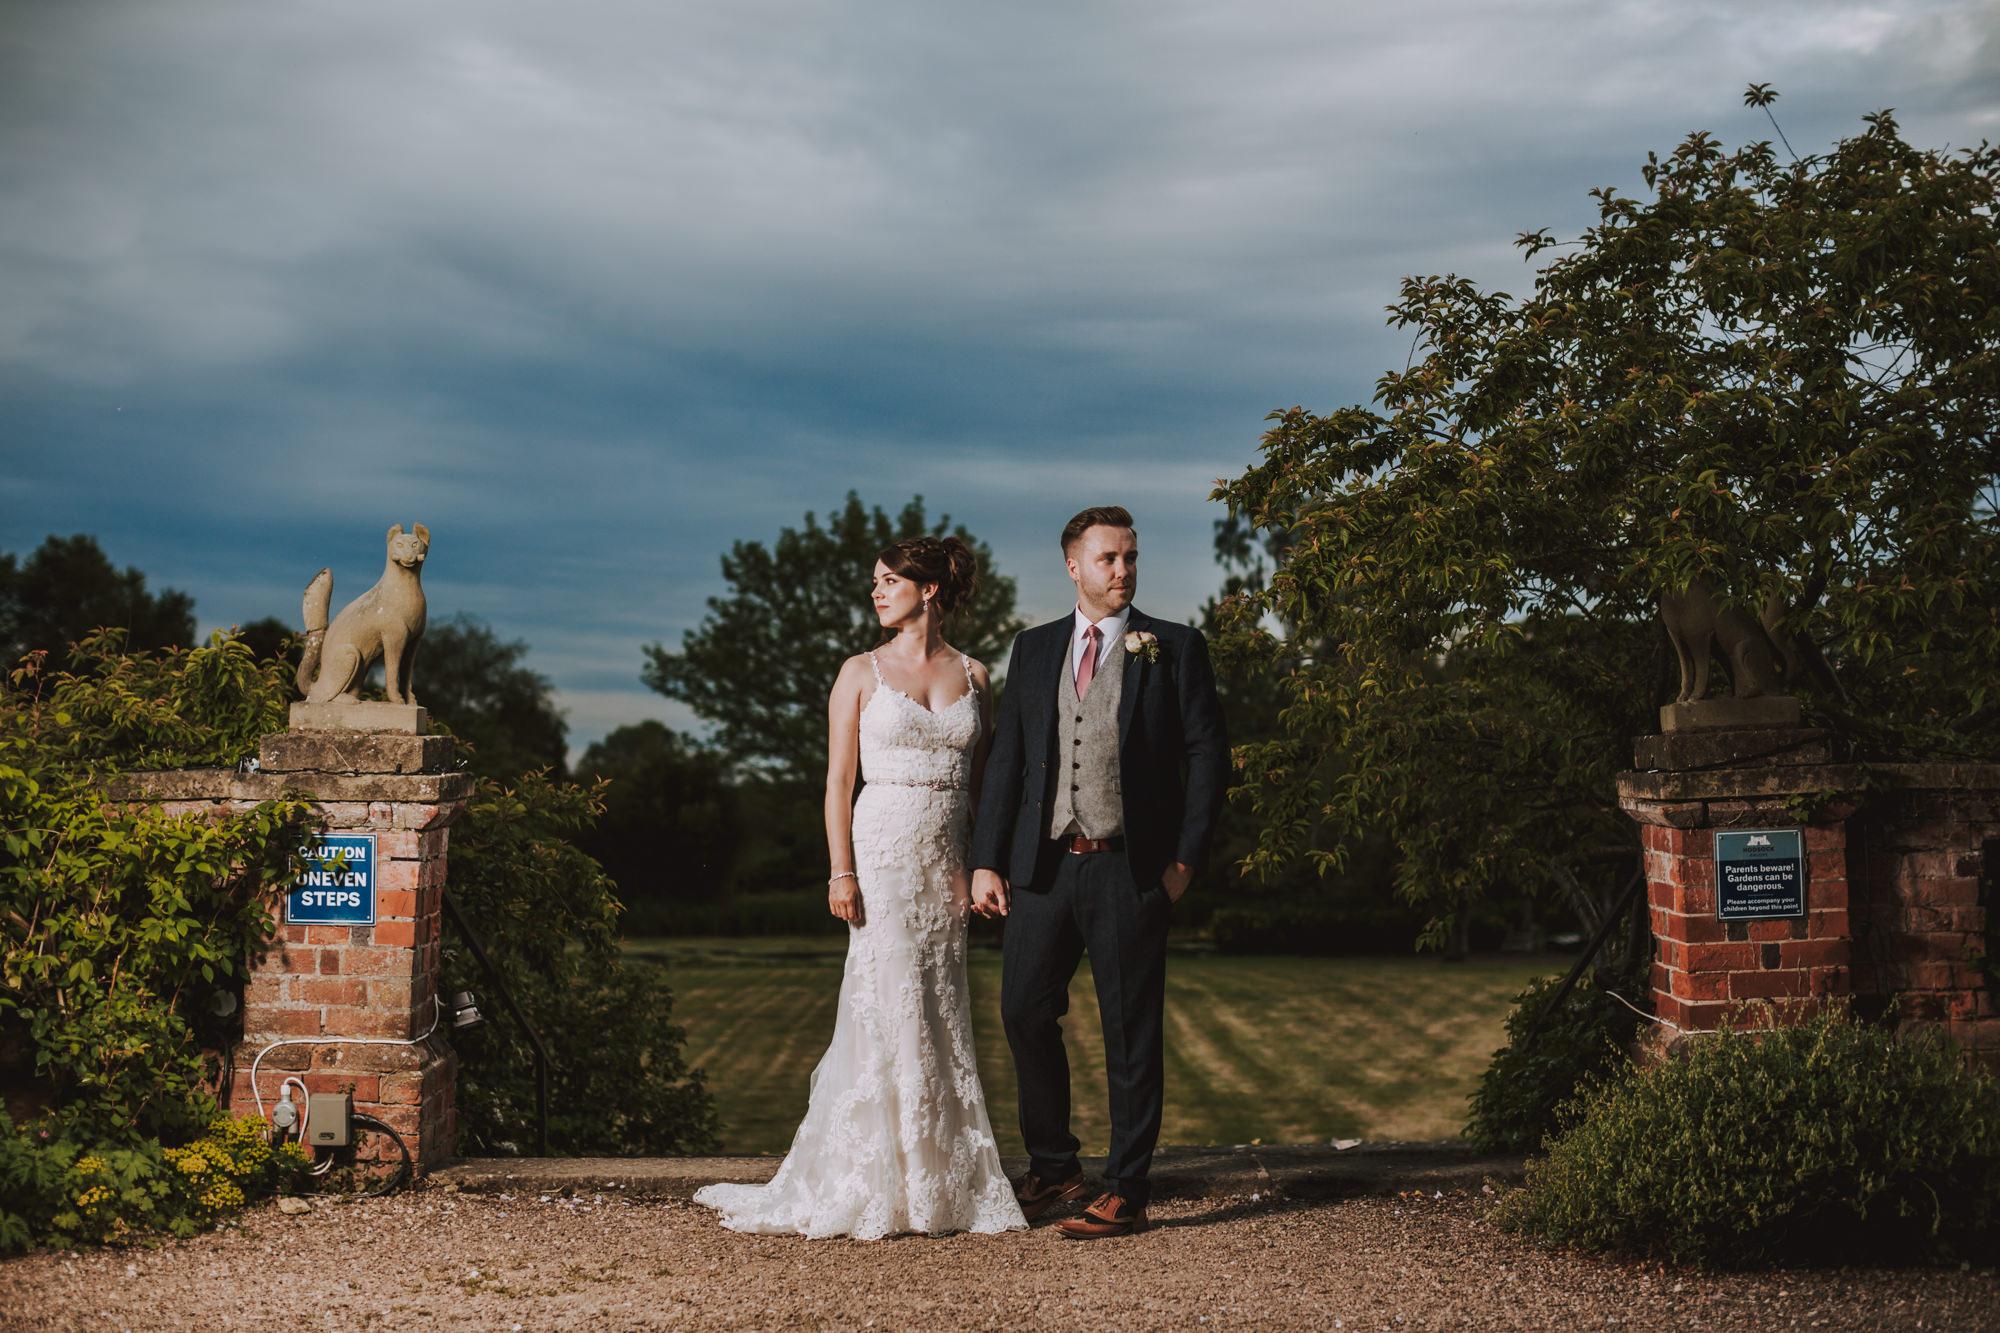 hodsock priory wedding photographers blog92.jpg